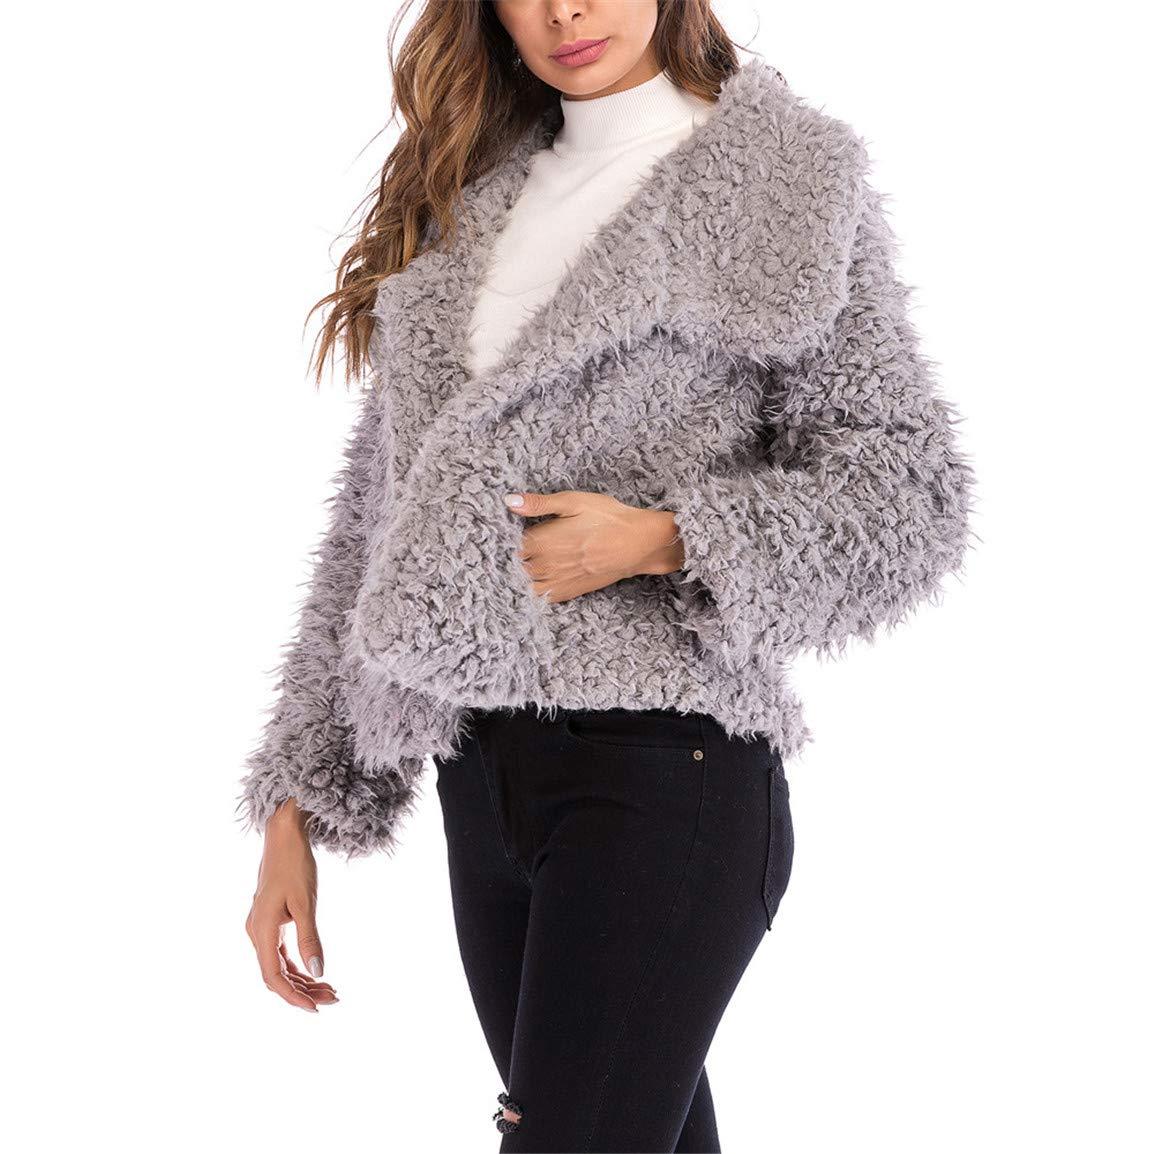 Moonuy Frauen Short Outwear Damen Vollmantel Mantel Solide